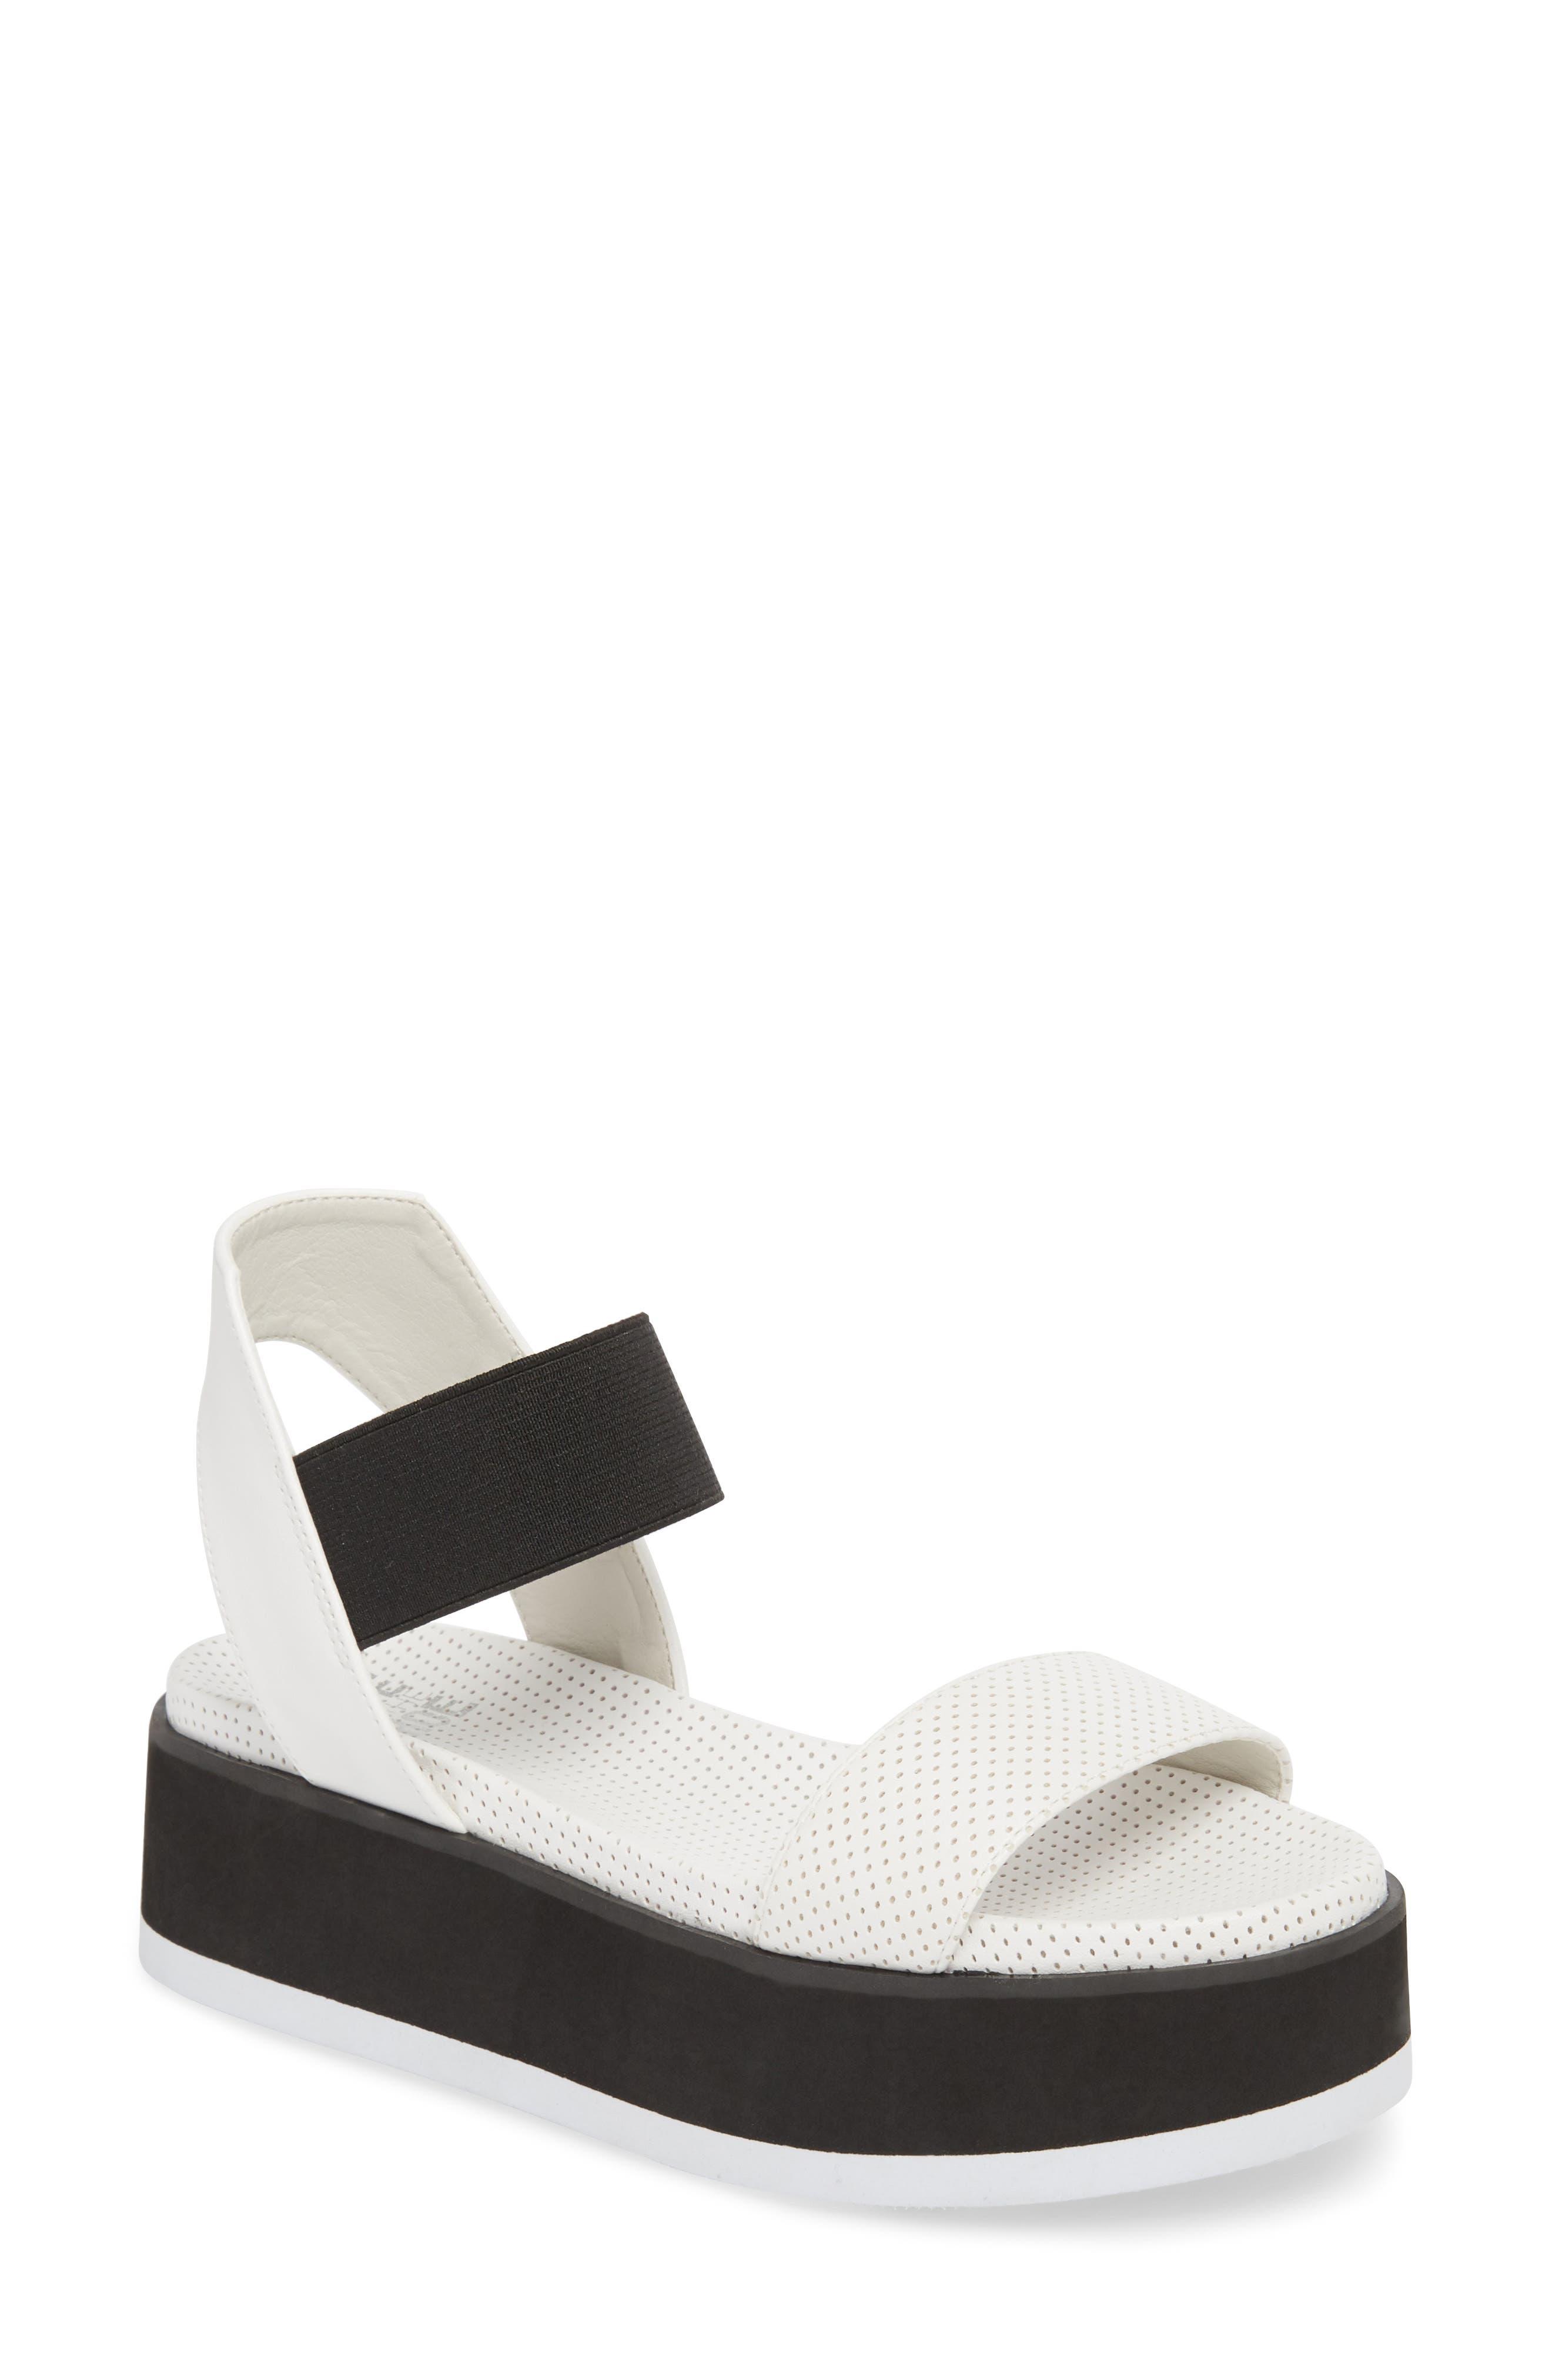 Josie Perforated Platform Sandal,                         Main,                         color, White